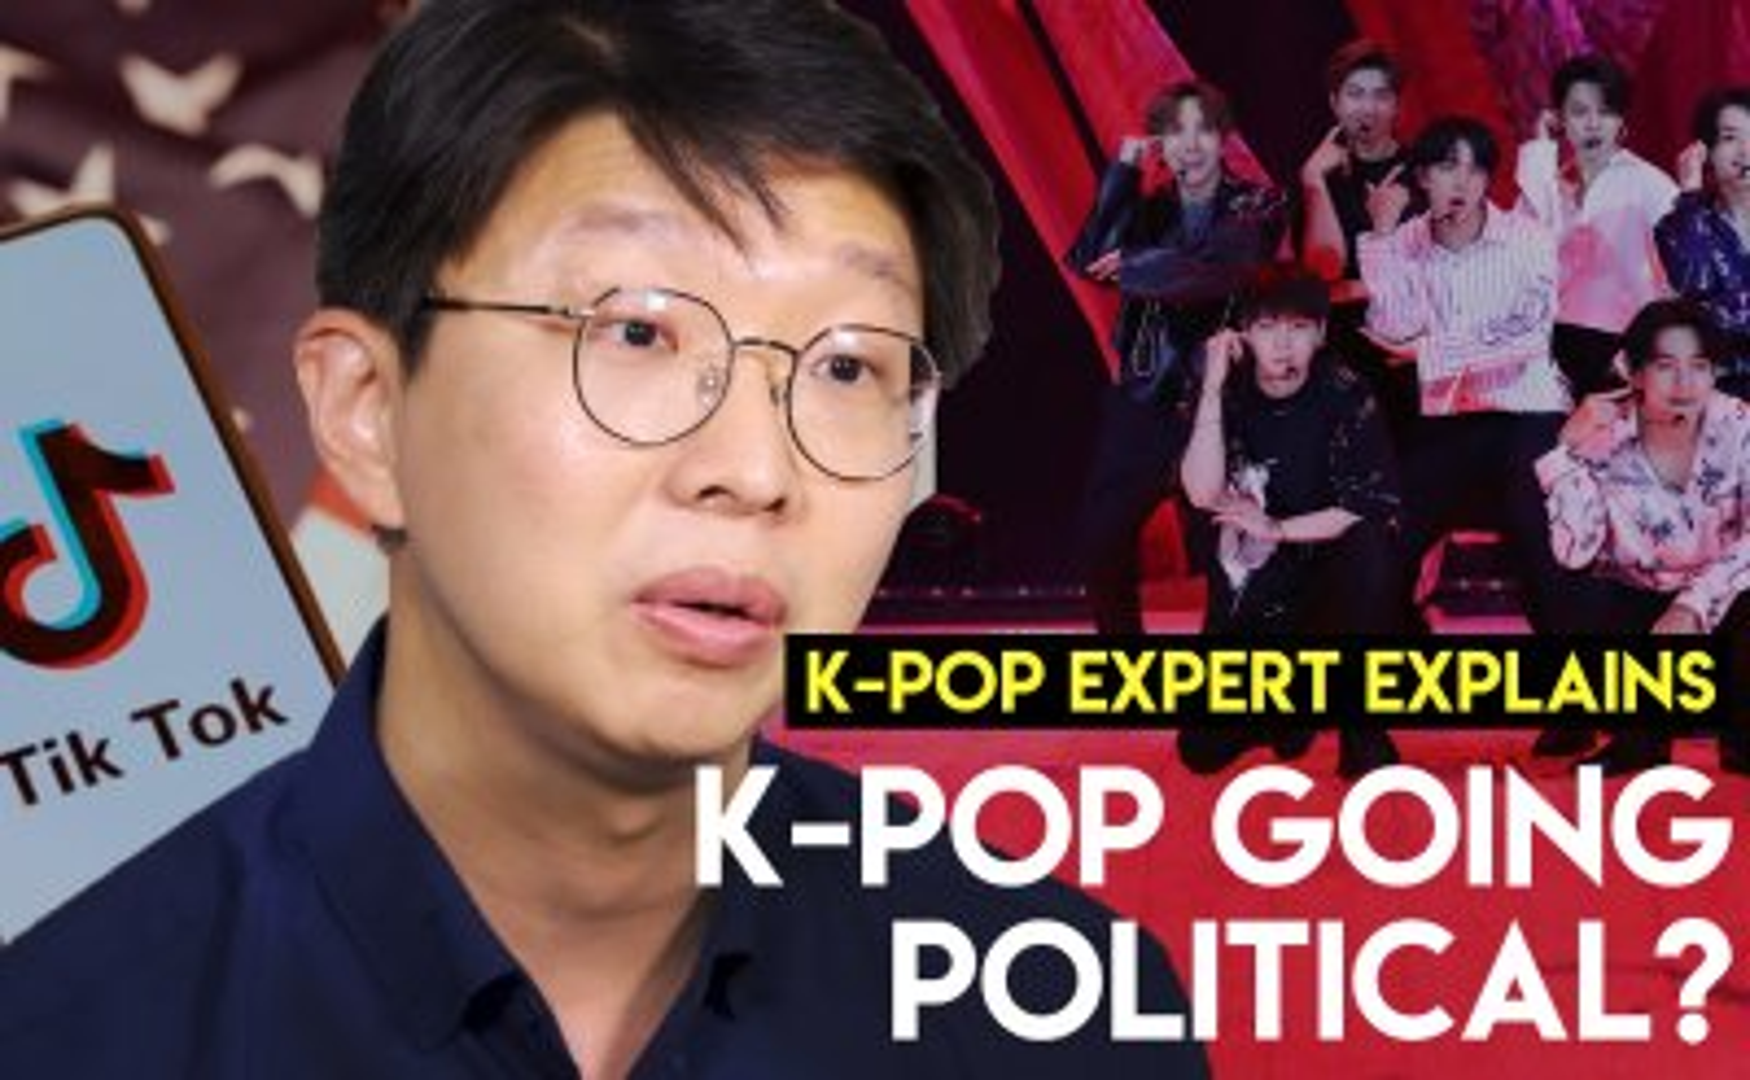 Debate: Should K-pop be apolitical vs. politcal?